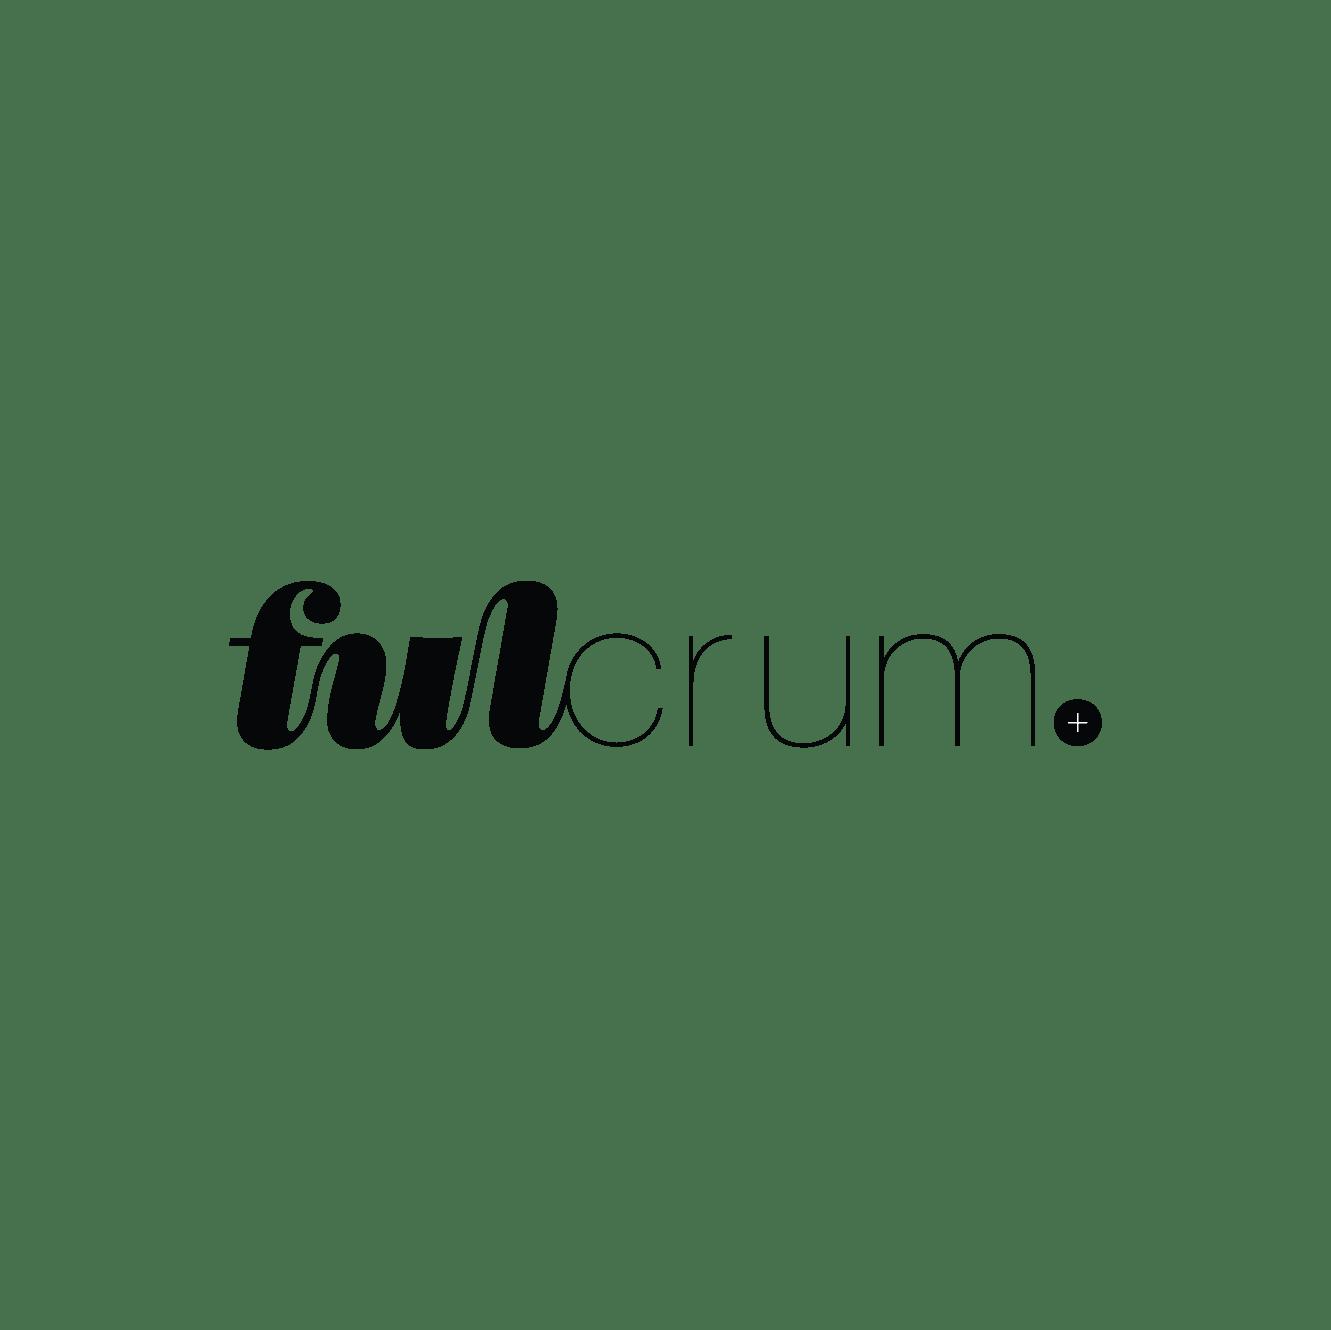 fulcrum_logosinitialselects_020419-29